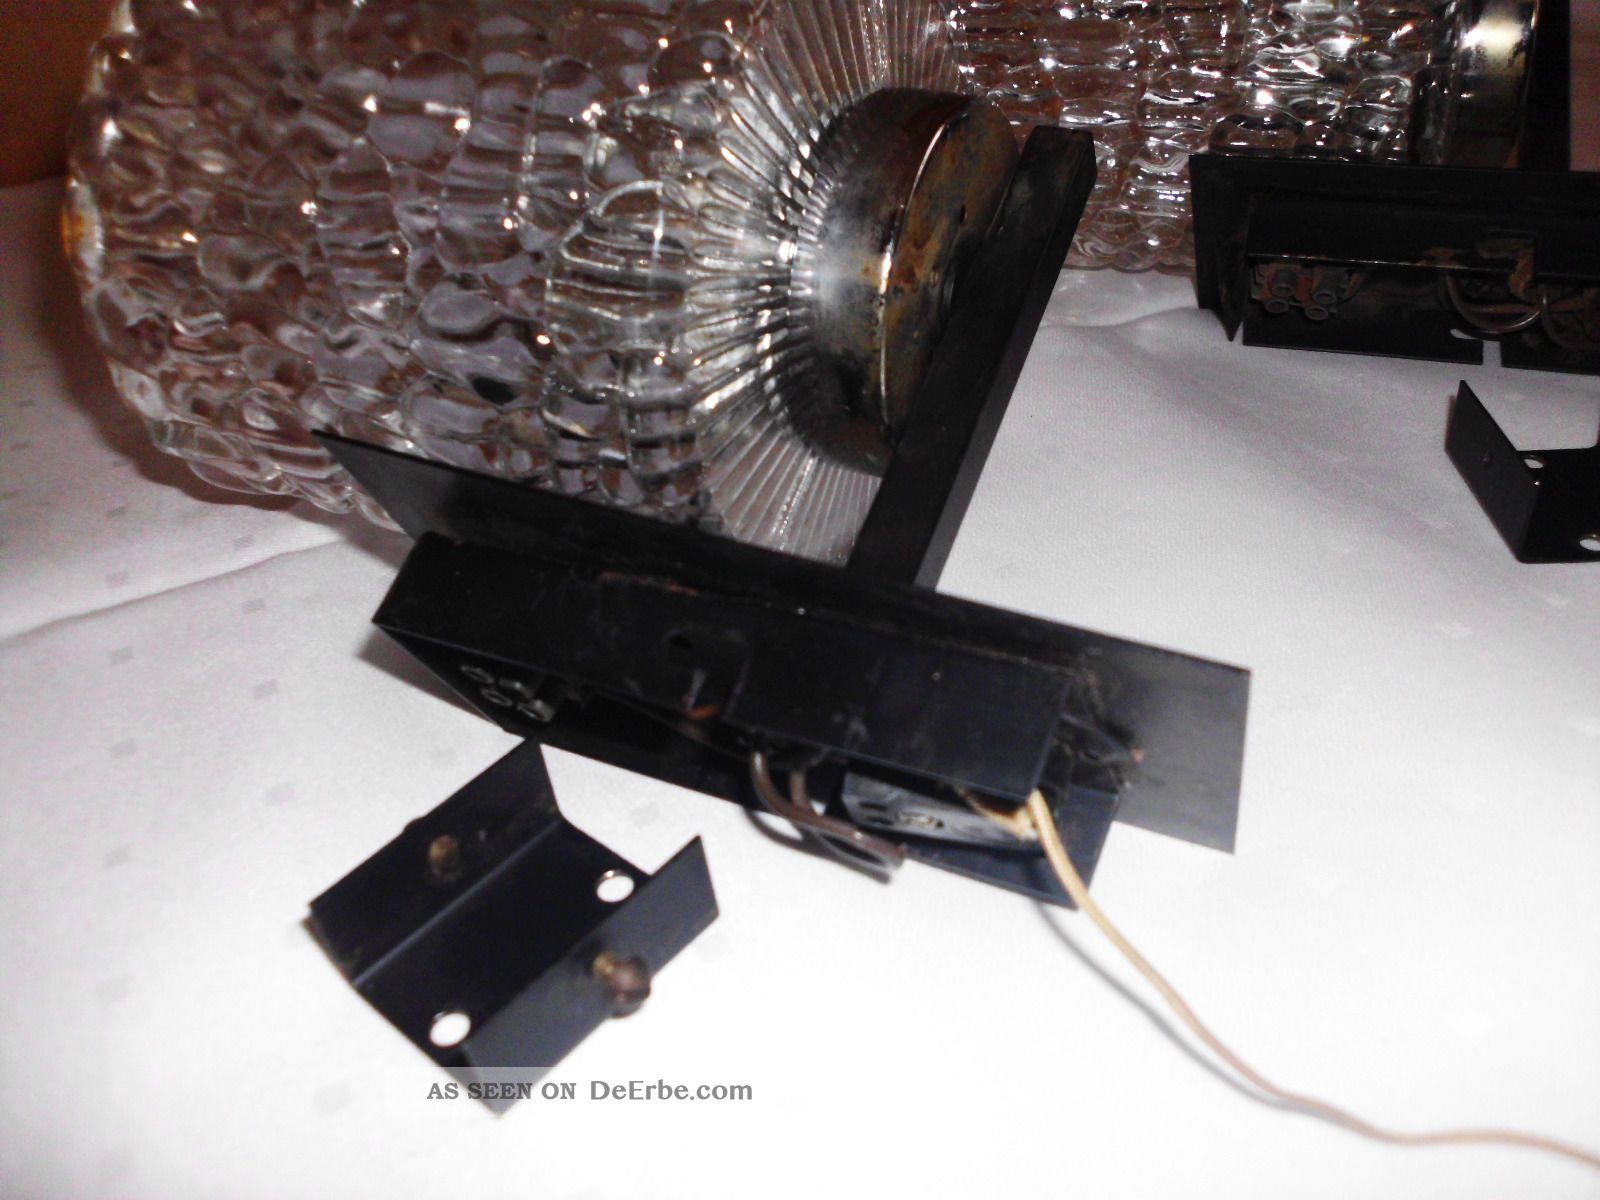 2 alte wandlampen metall mit glas kristall schirm lampen 60er 70er jahre. Black Bedroom Furniture Sets. Home Design Ideas